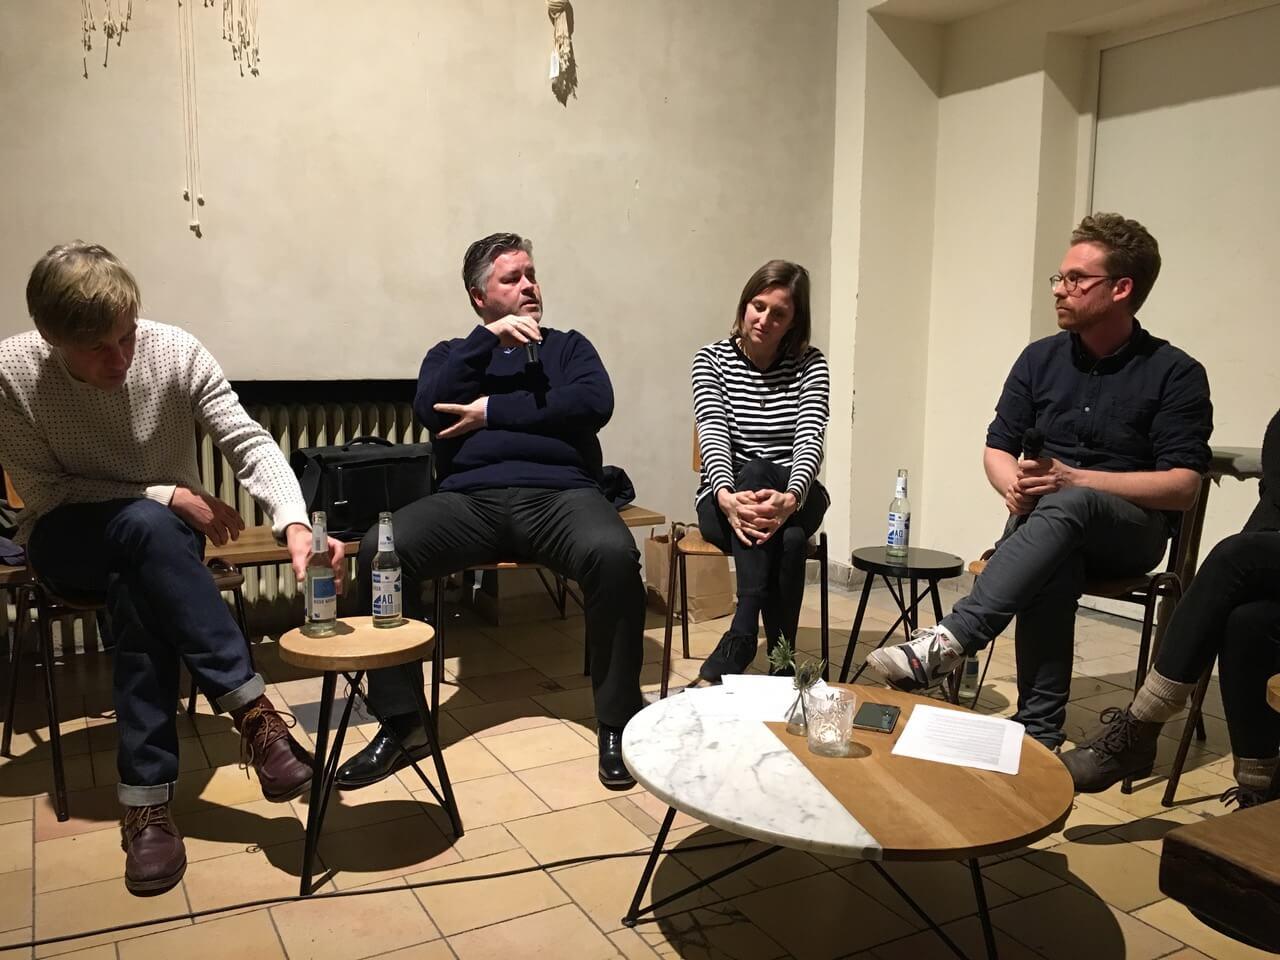 robert stock - medien-tools gastronomie FEC Tuesday #13: Wachstum in der Gastronomie - Gesprächsnotizen